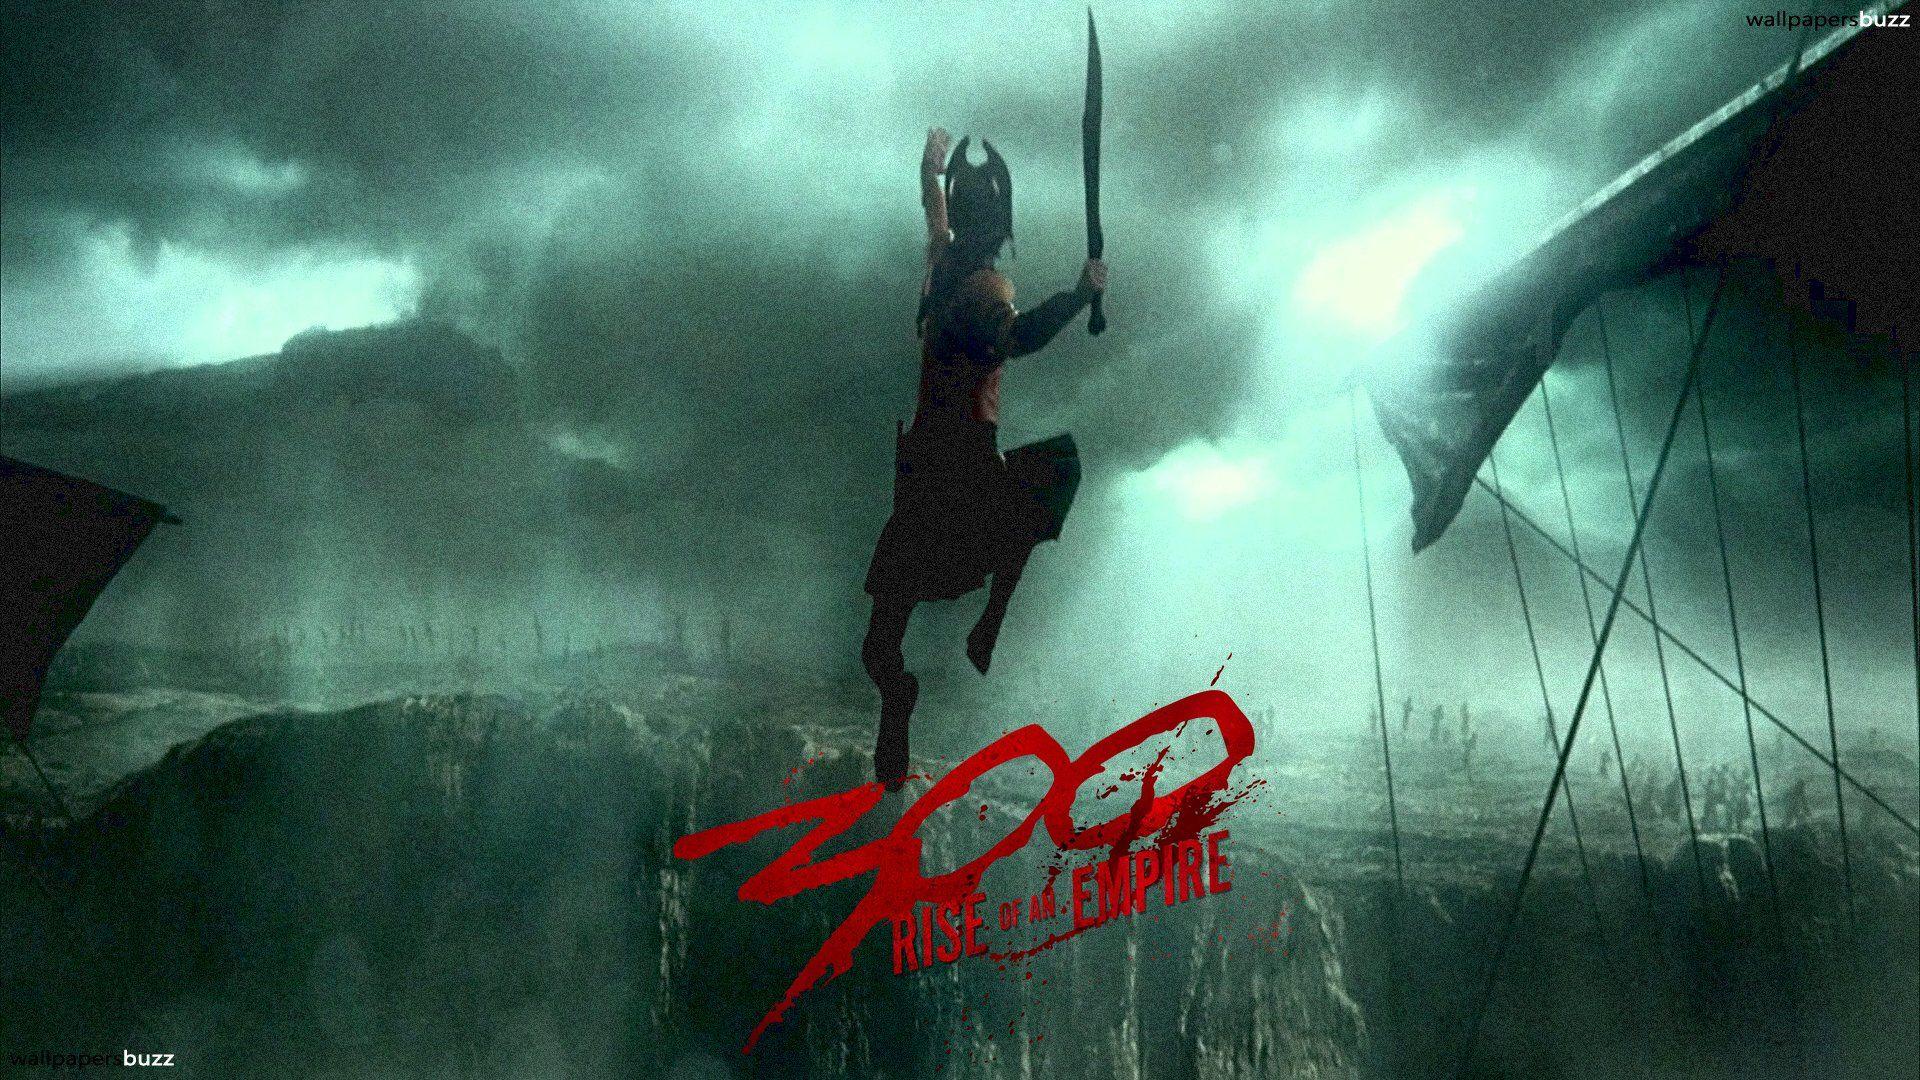 Best Wallpaper Movie Warrior - 2ea2a6061b463642a16f4235c731b1bc  2018_845651.jpg